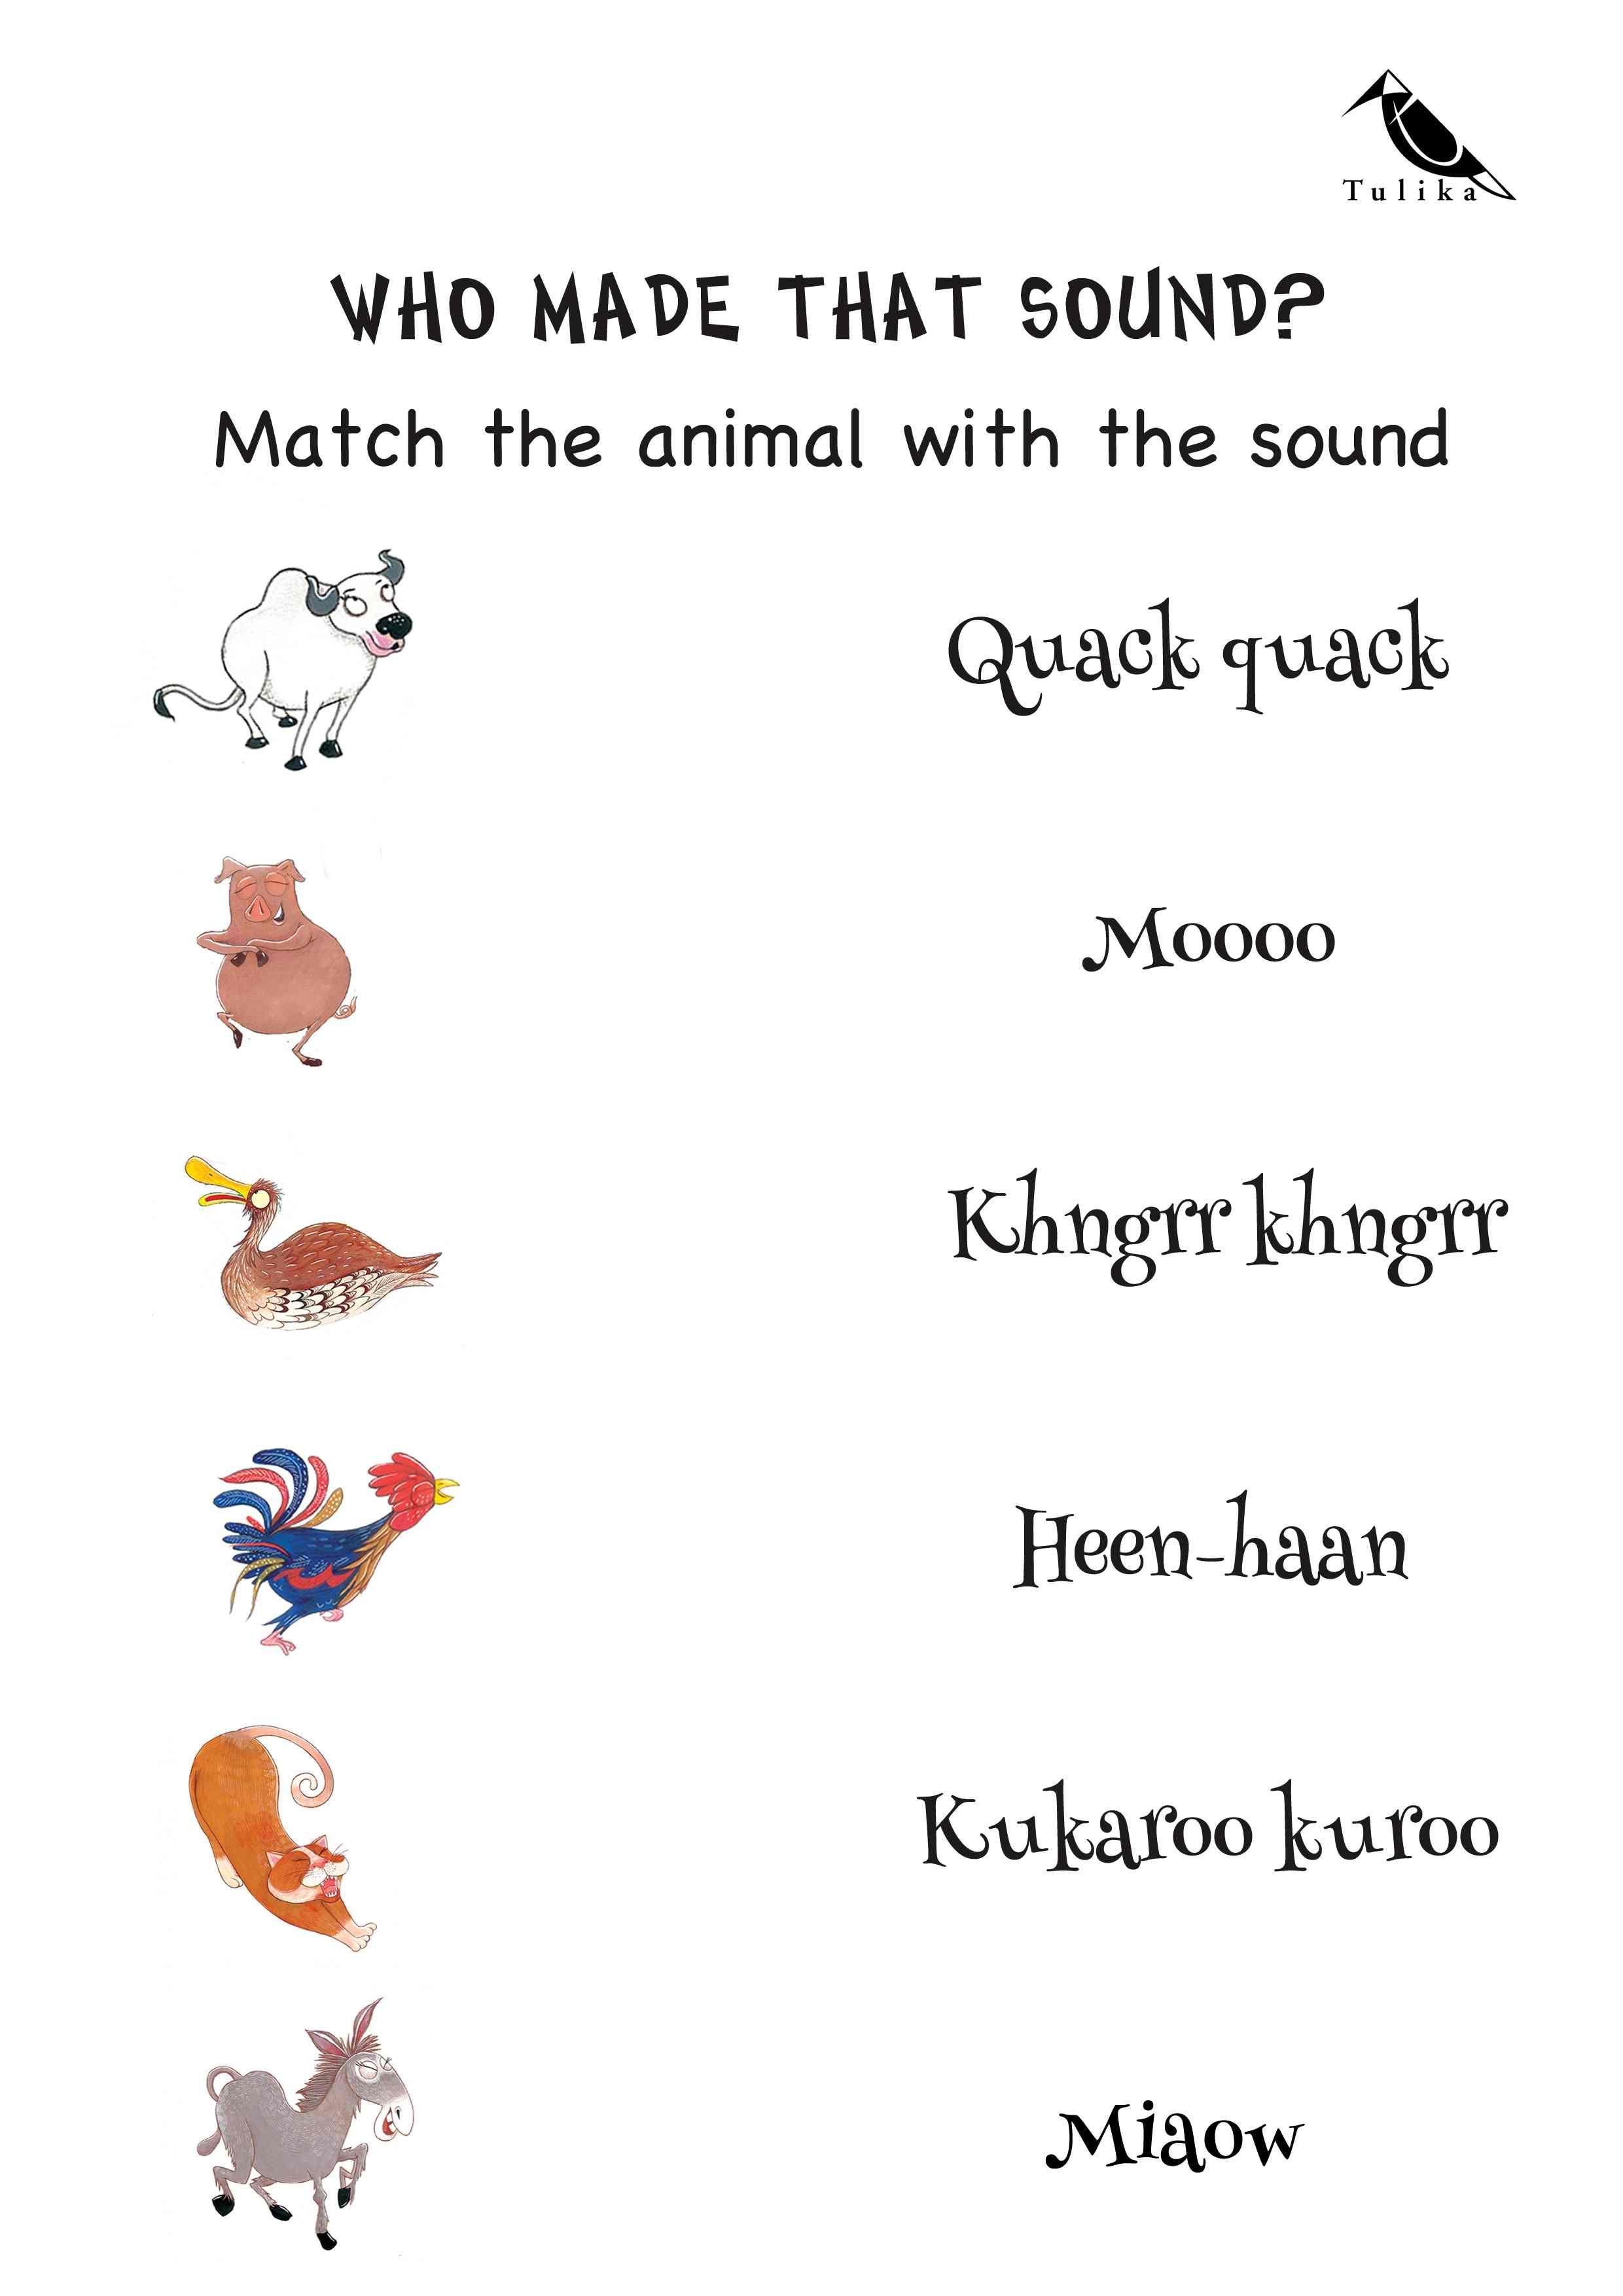 Animal Sound Worksheet For Kindergarten Worksheets Are An I In 2021 Kindergarten Worksheets Sight Words Kindergarten Phonics Worksheets Letter Recognition Worksheets Animal sound worksheet for kindergarten